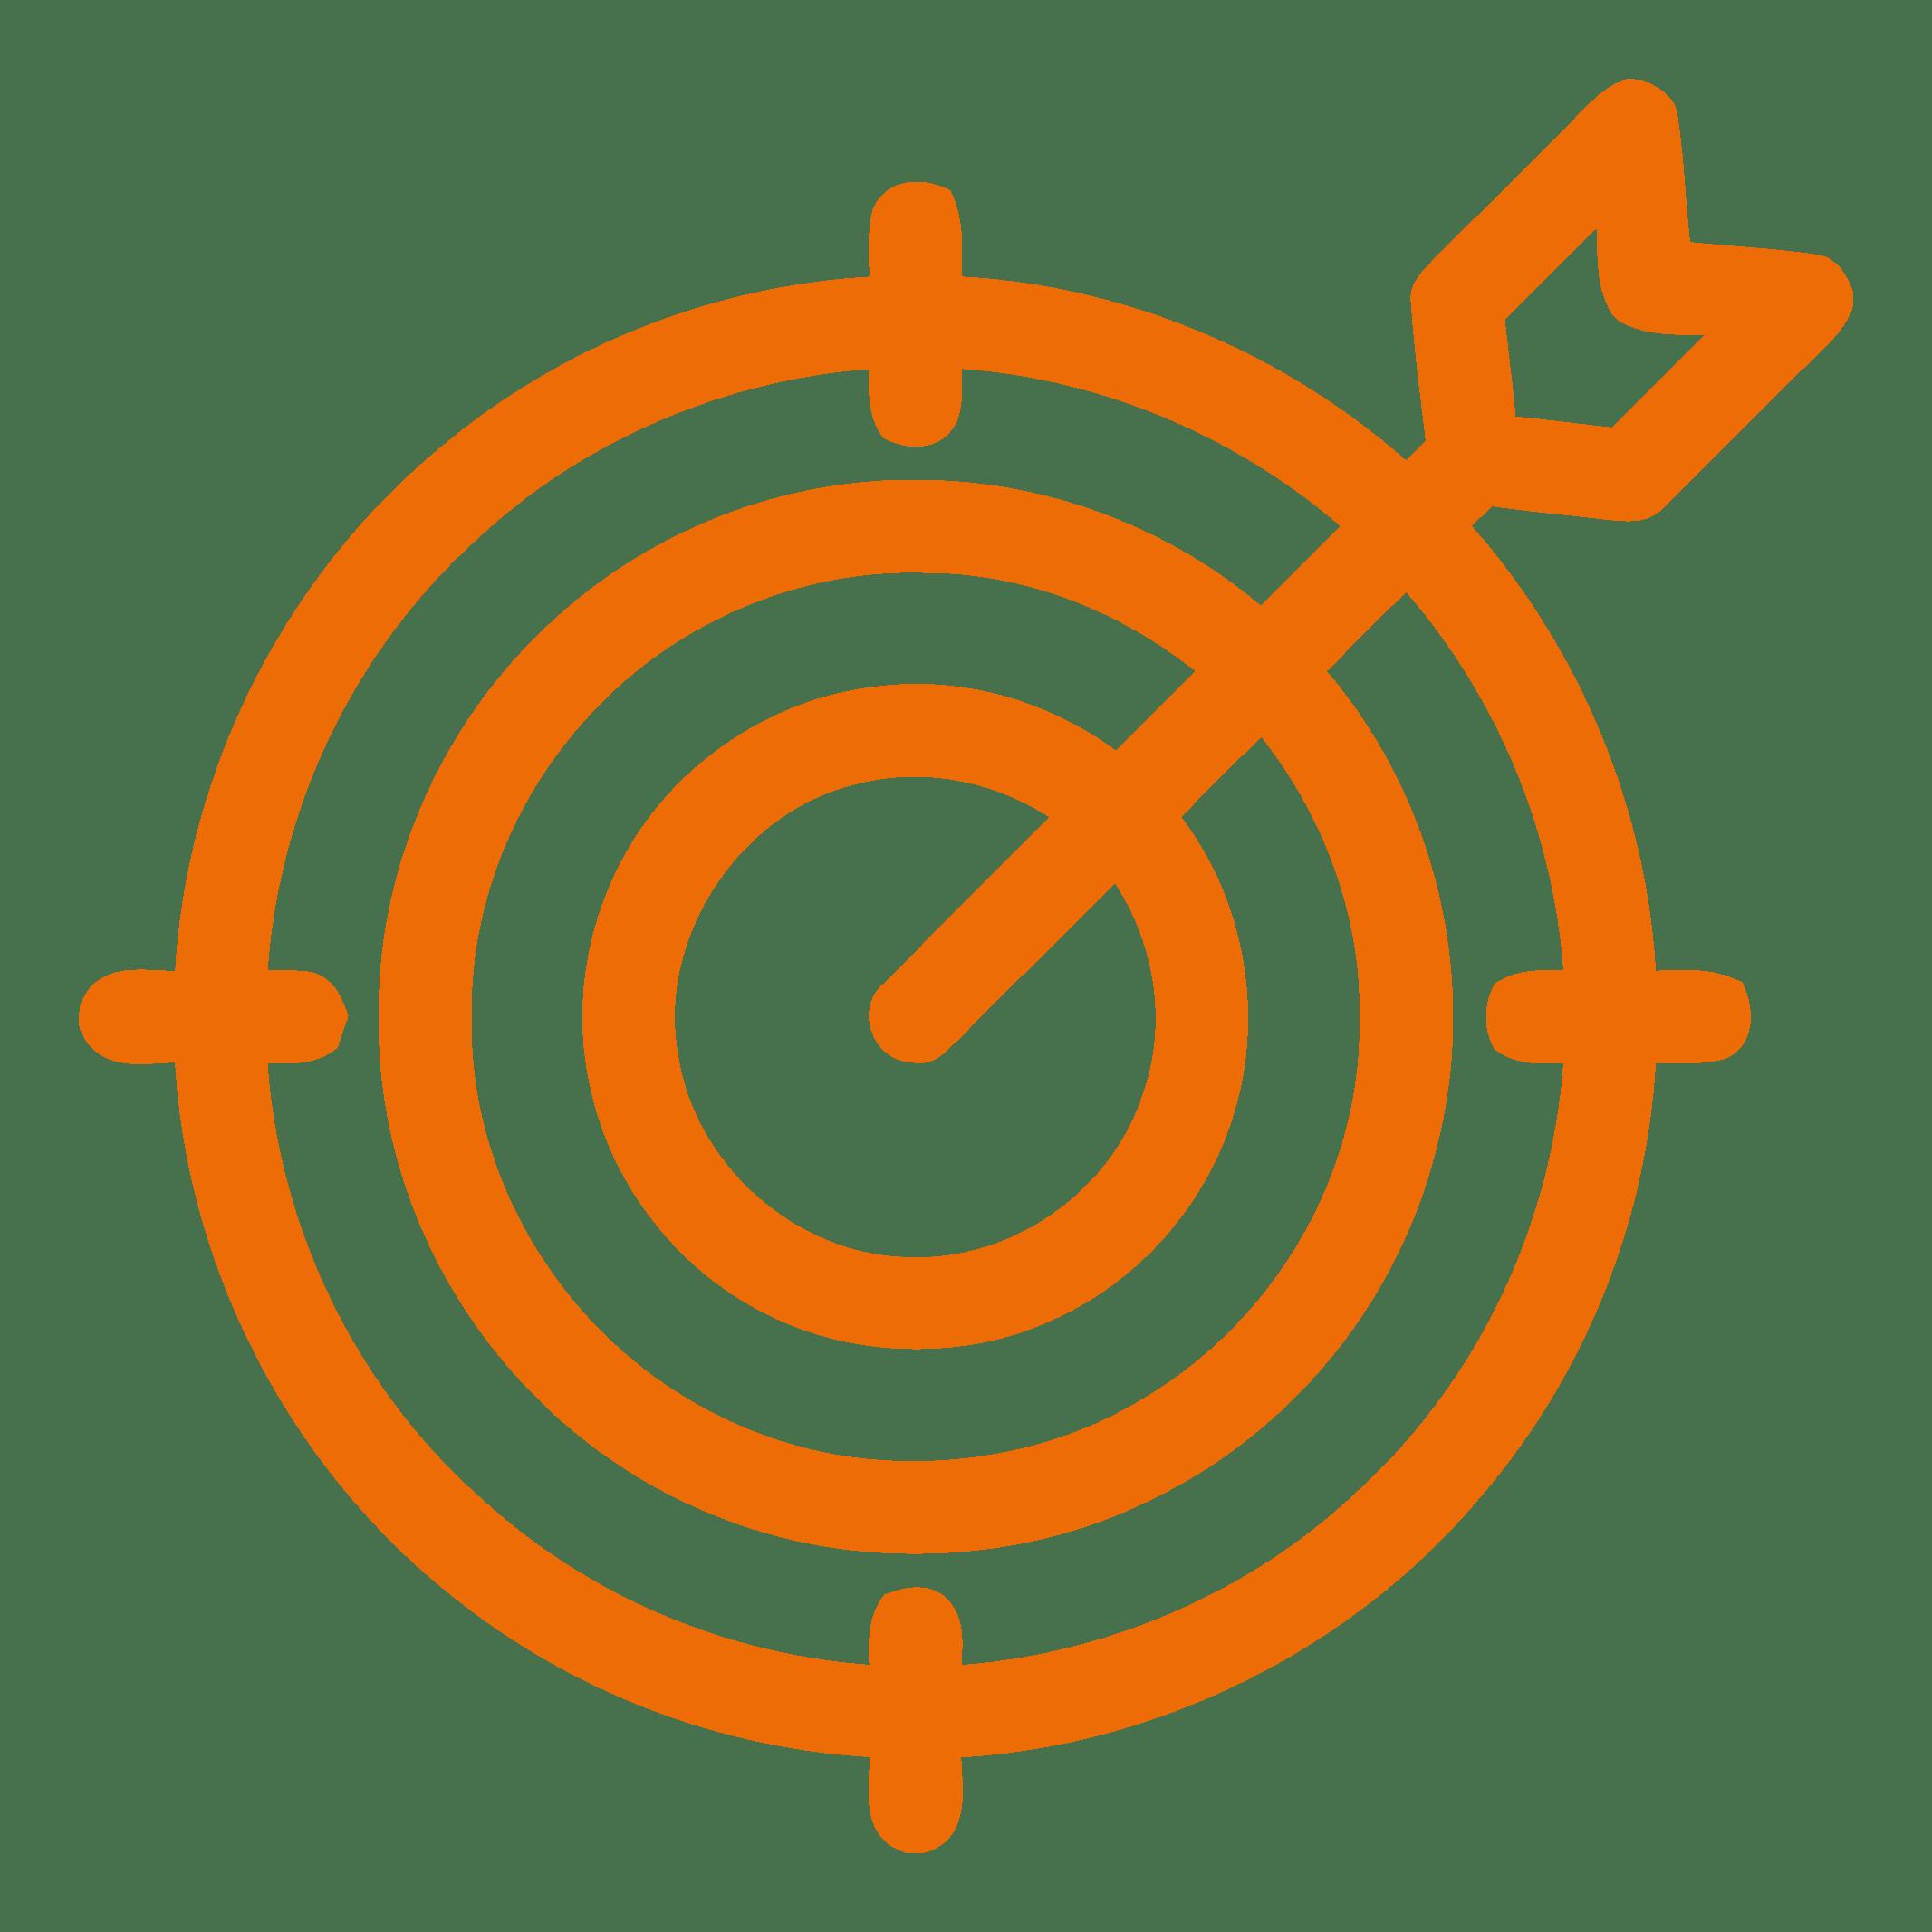 icon_8-11